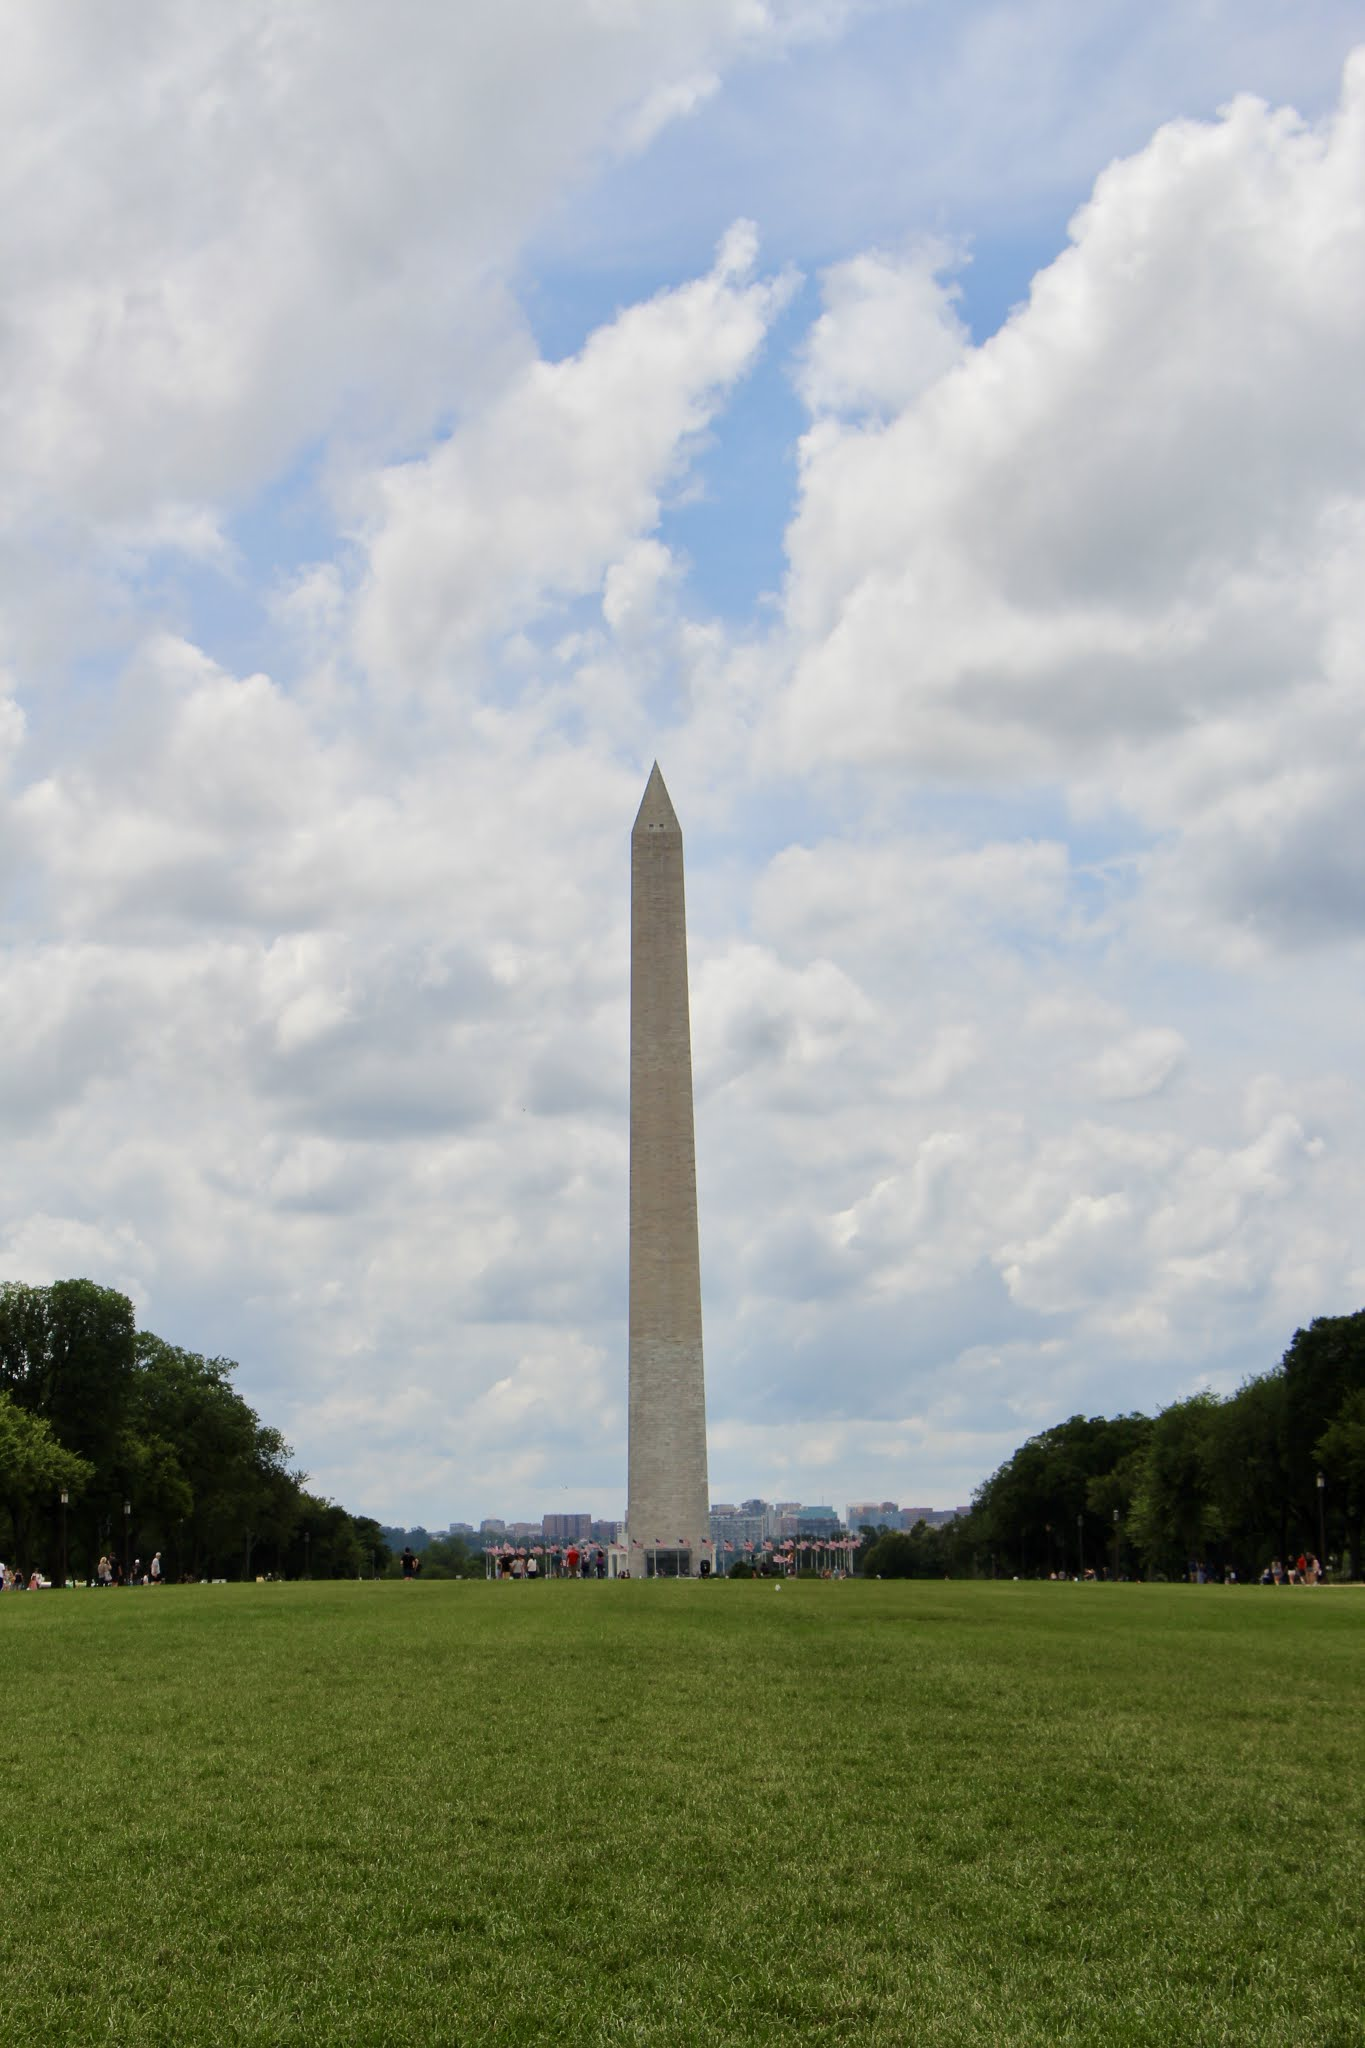 travel guide, Washington monument